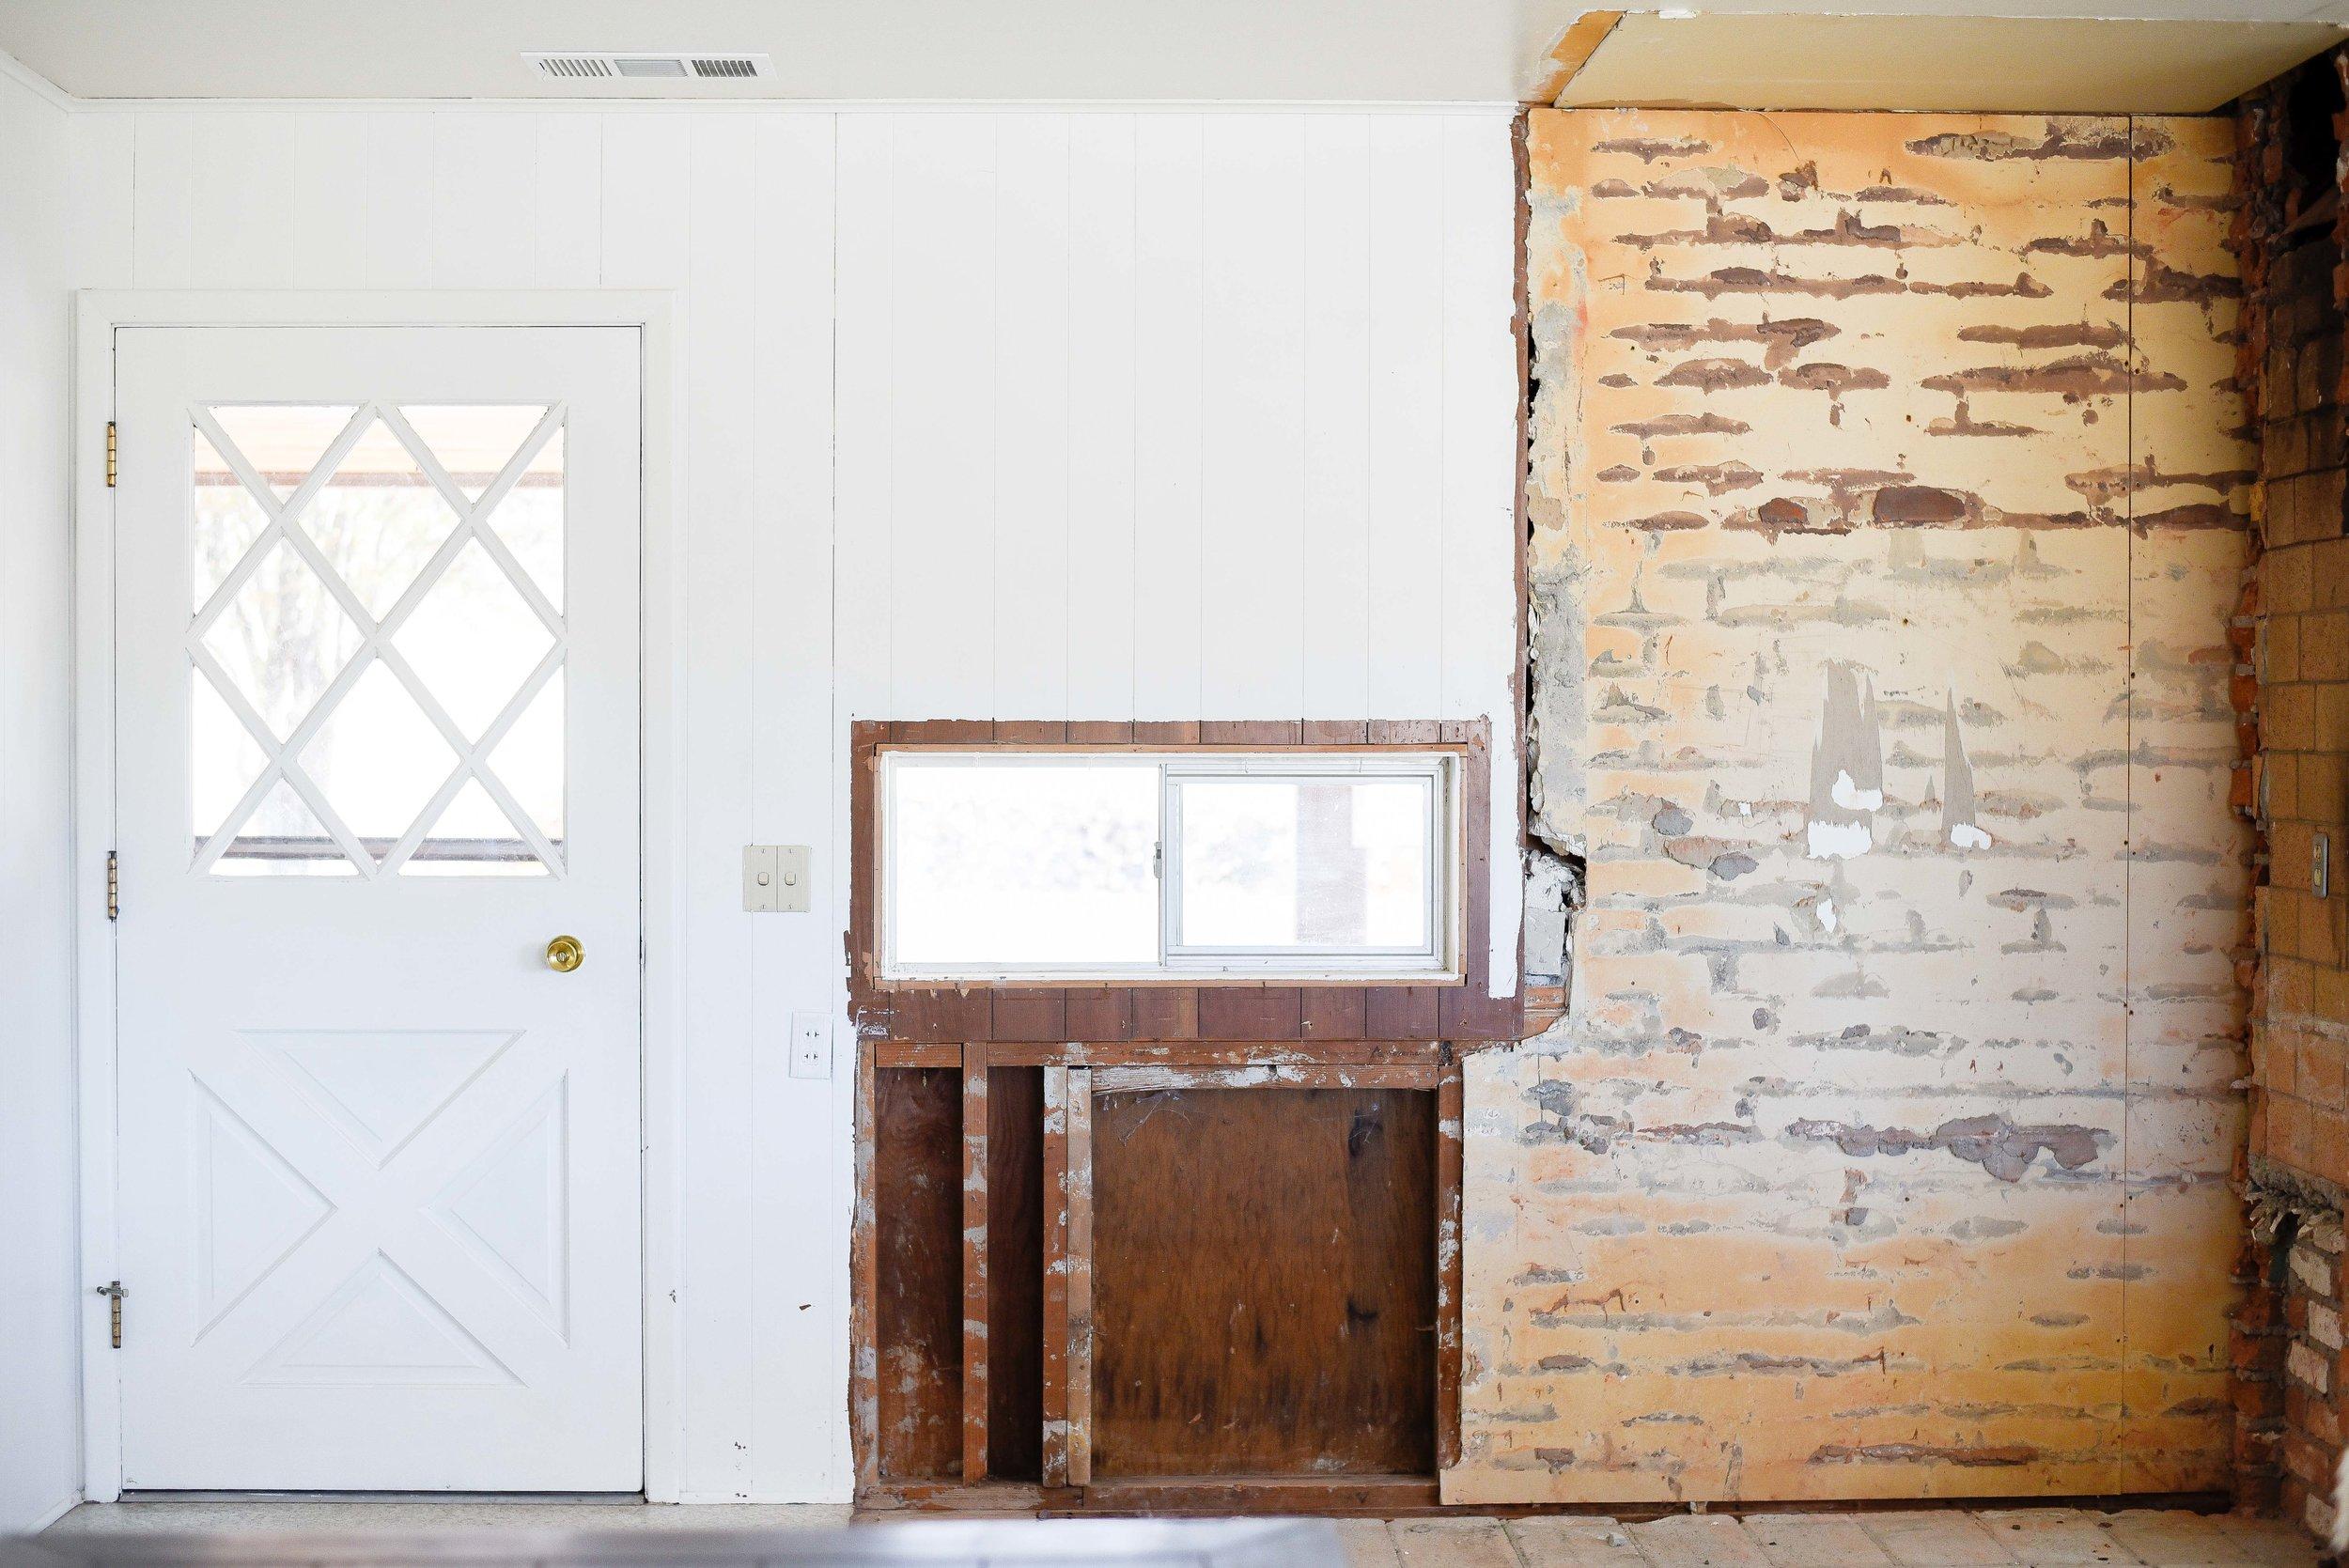 60's farmhouse renovation - DIY French door installation | boxwoodavenue.com